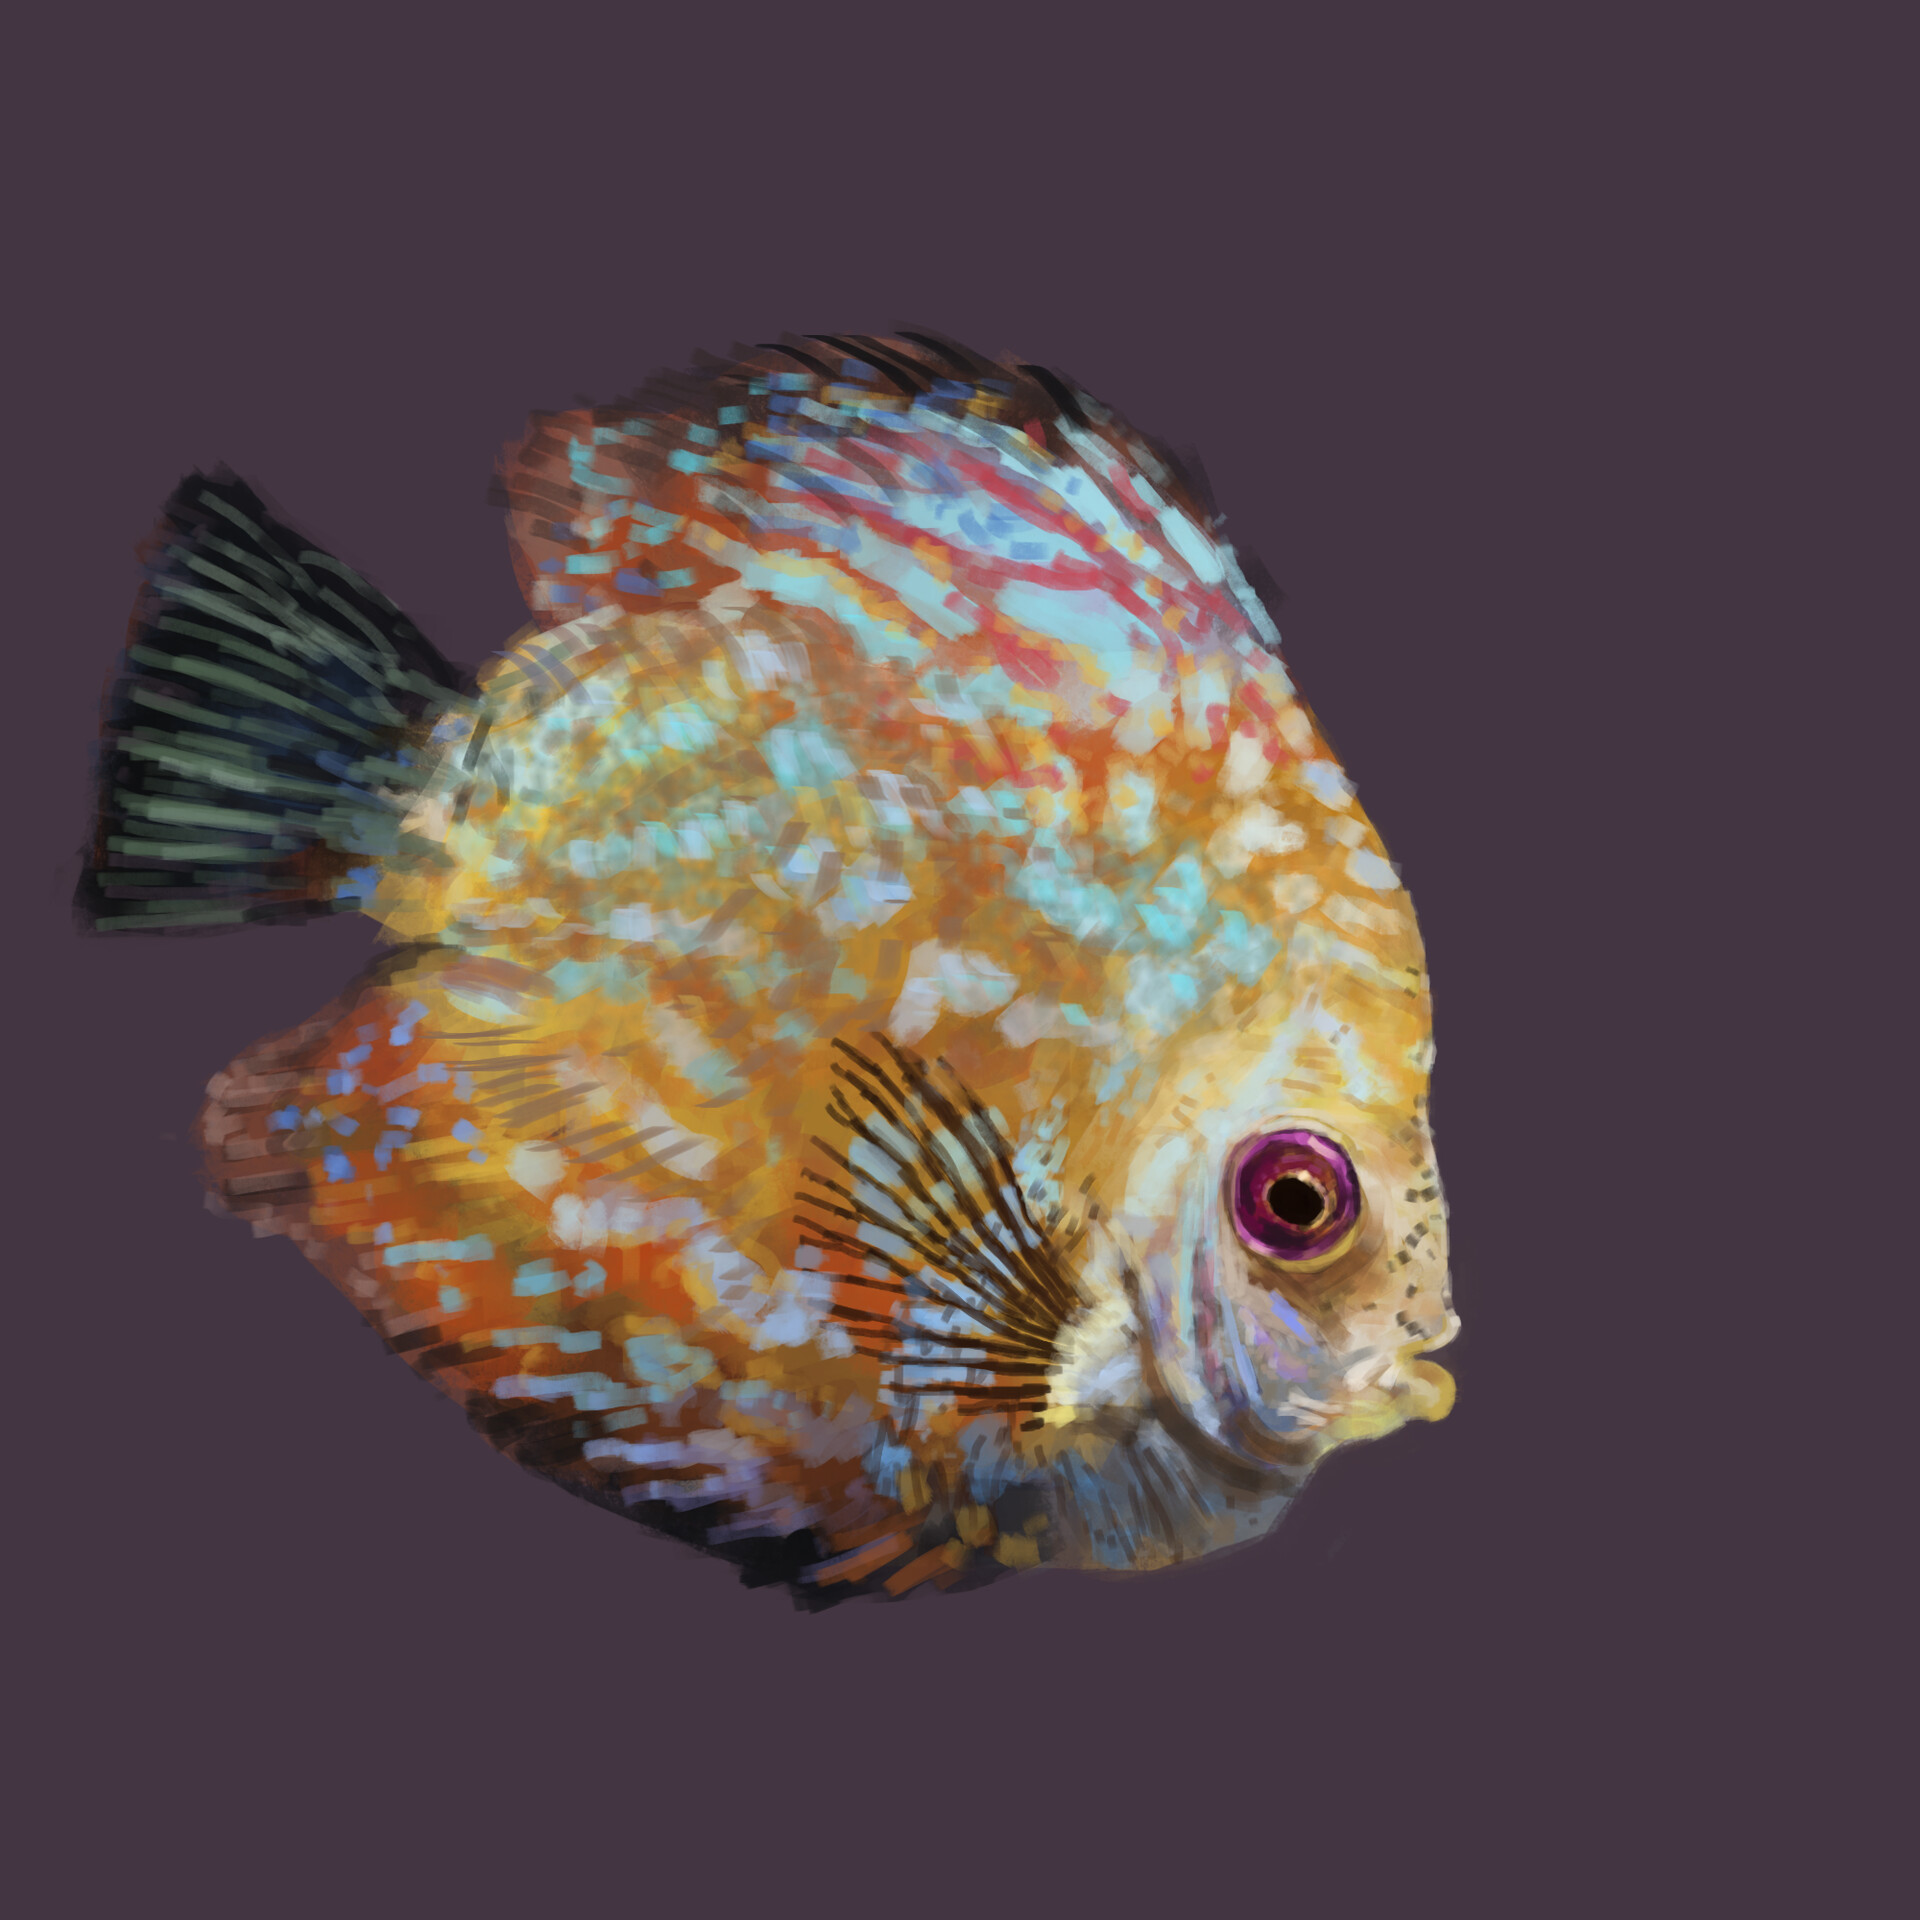 26 Reference: https://cdn.pixabay.com/photo/2016/12/31/21/22/discus-fish-1943755_960_720.jpg